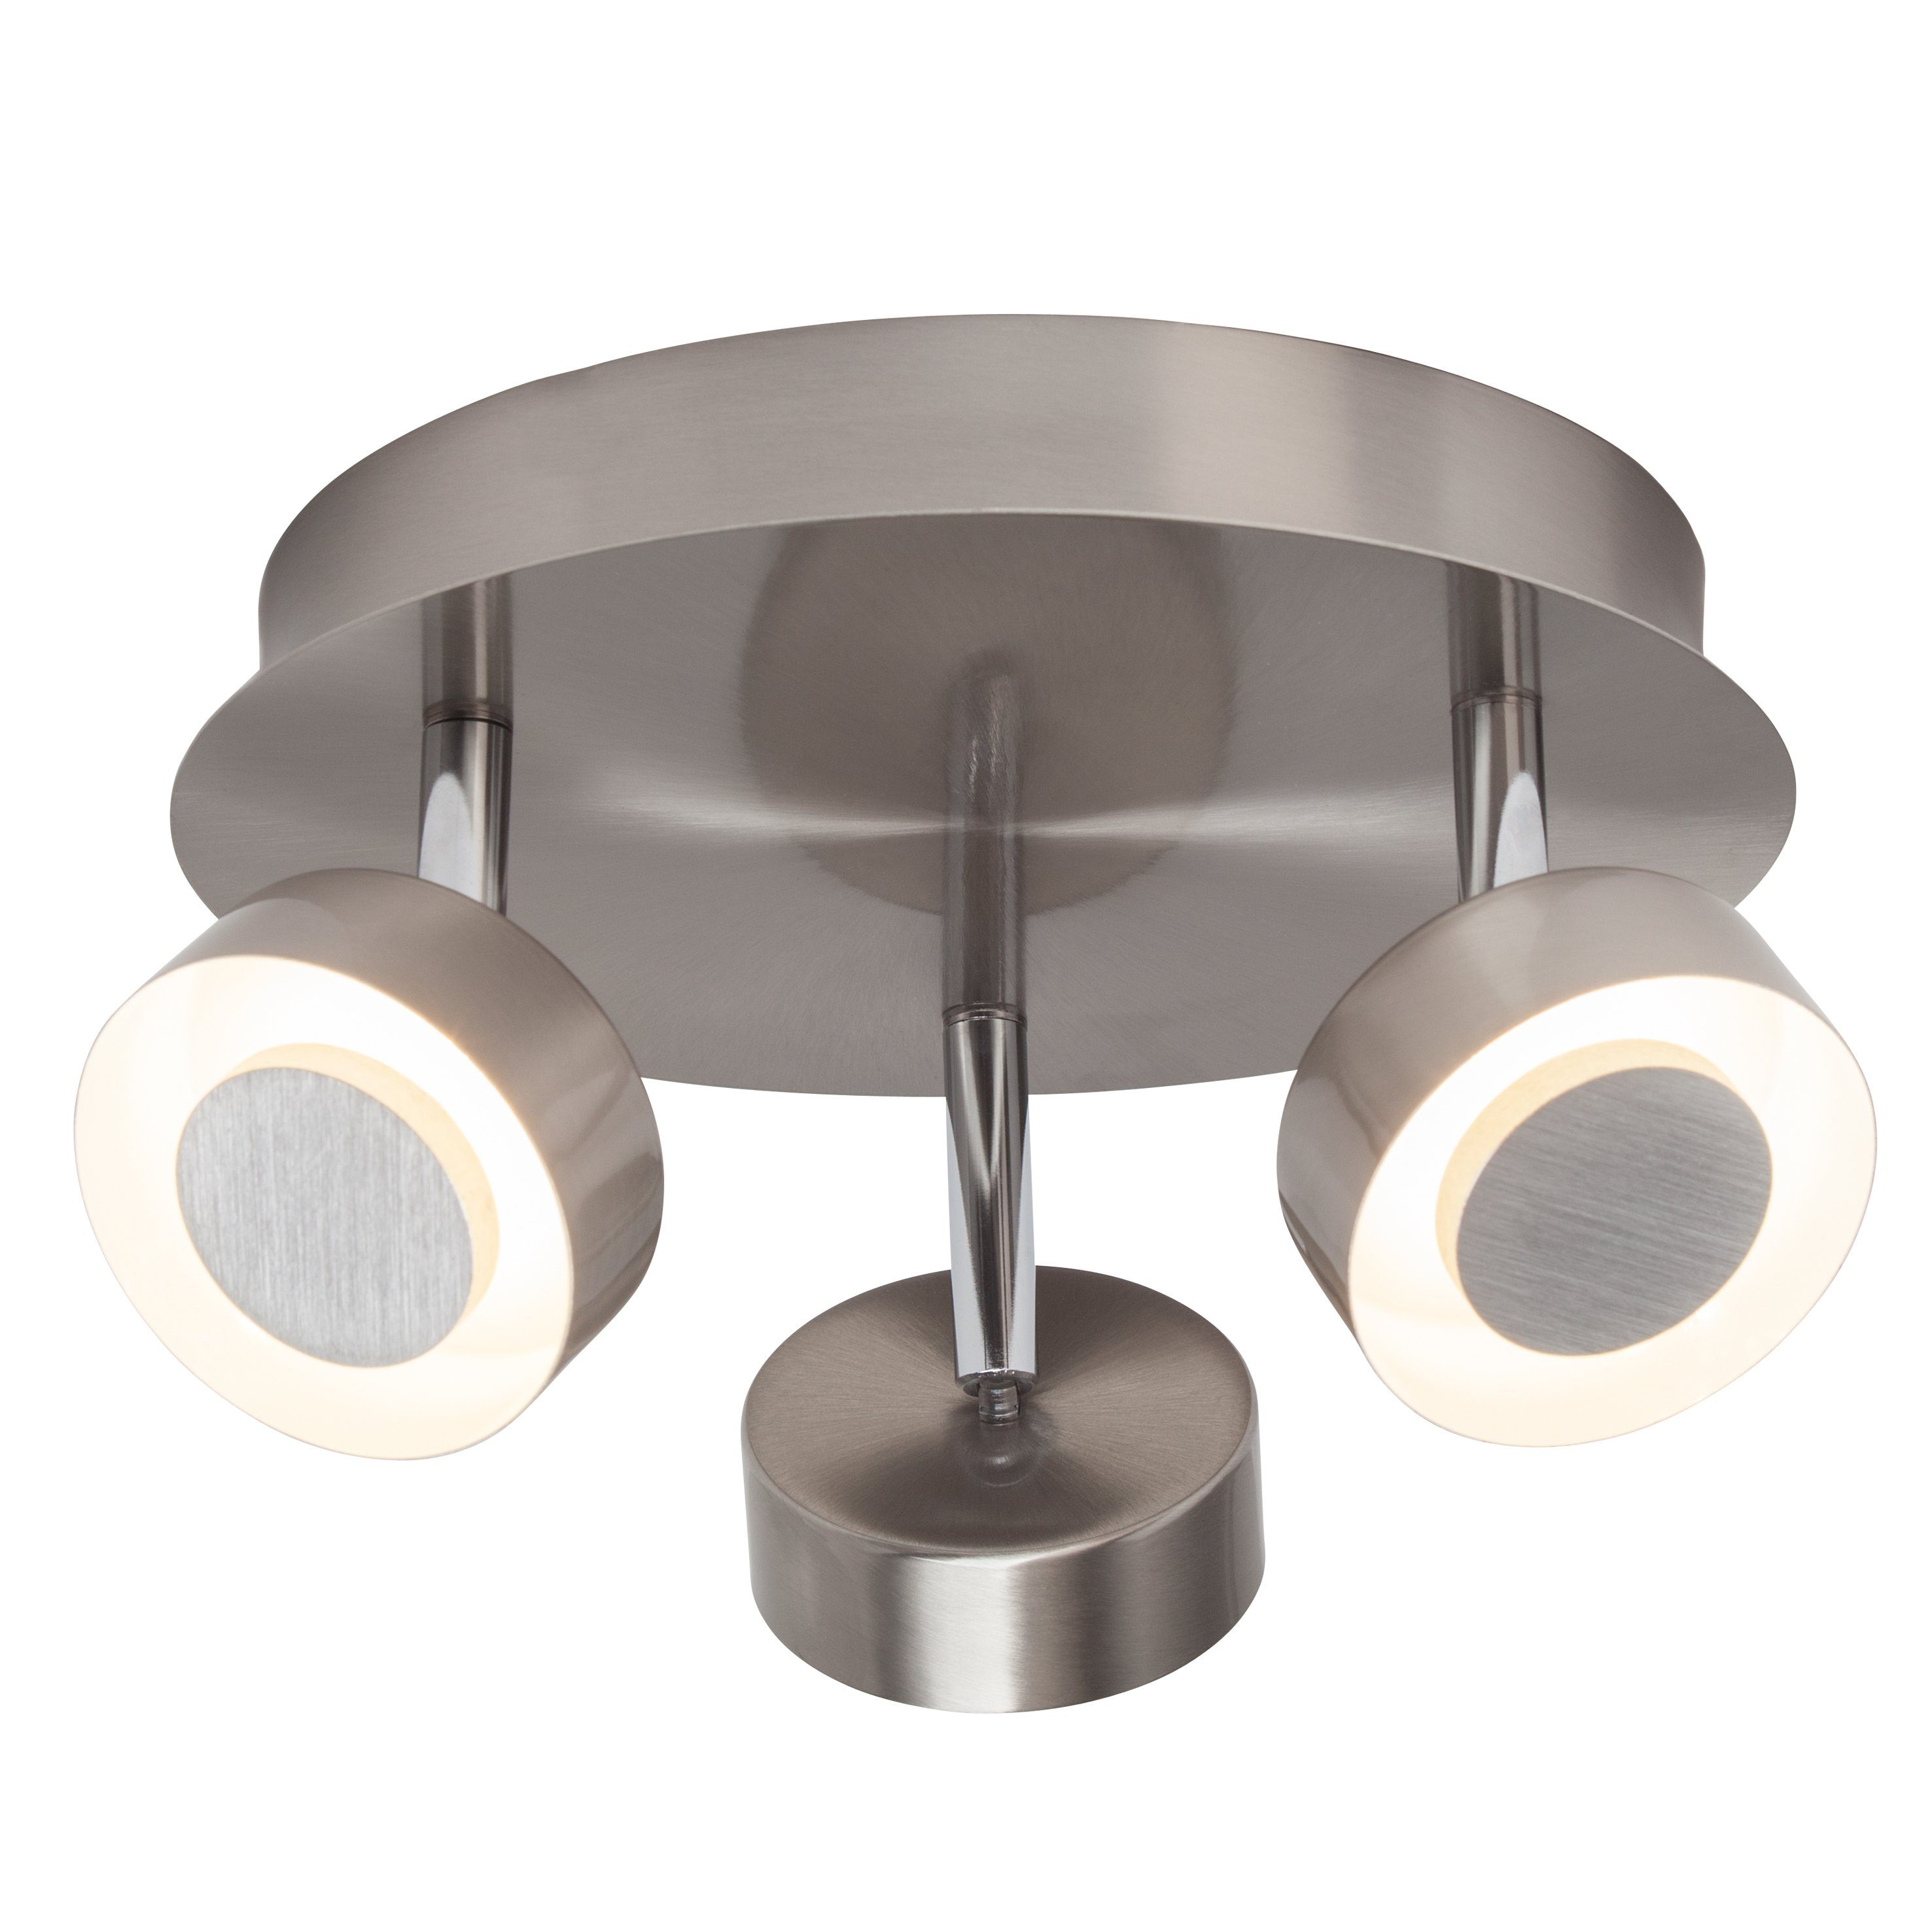 Brilliant Leuchten Orban LED Spotrondell, 3-flammig eisen